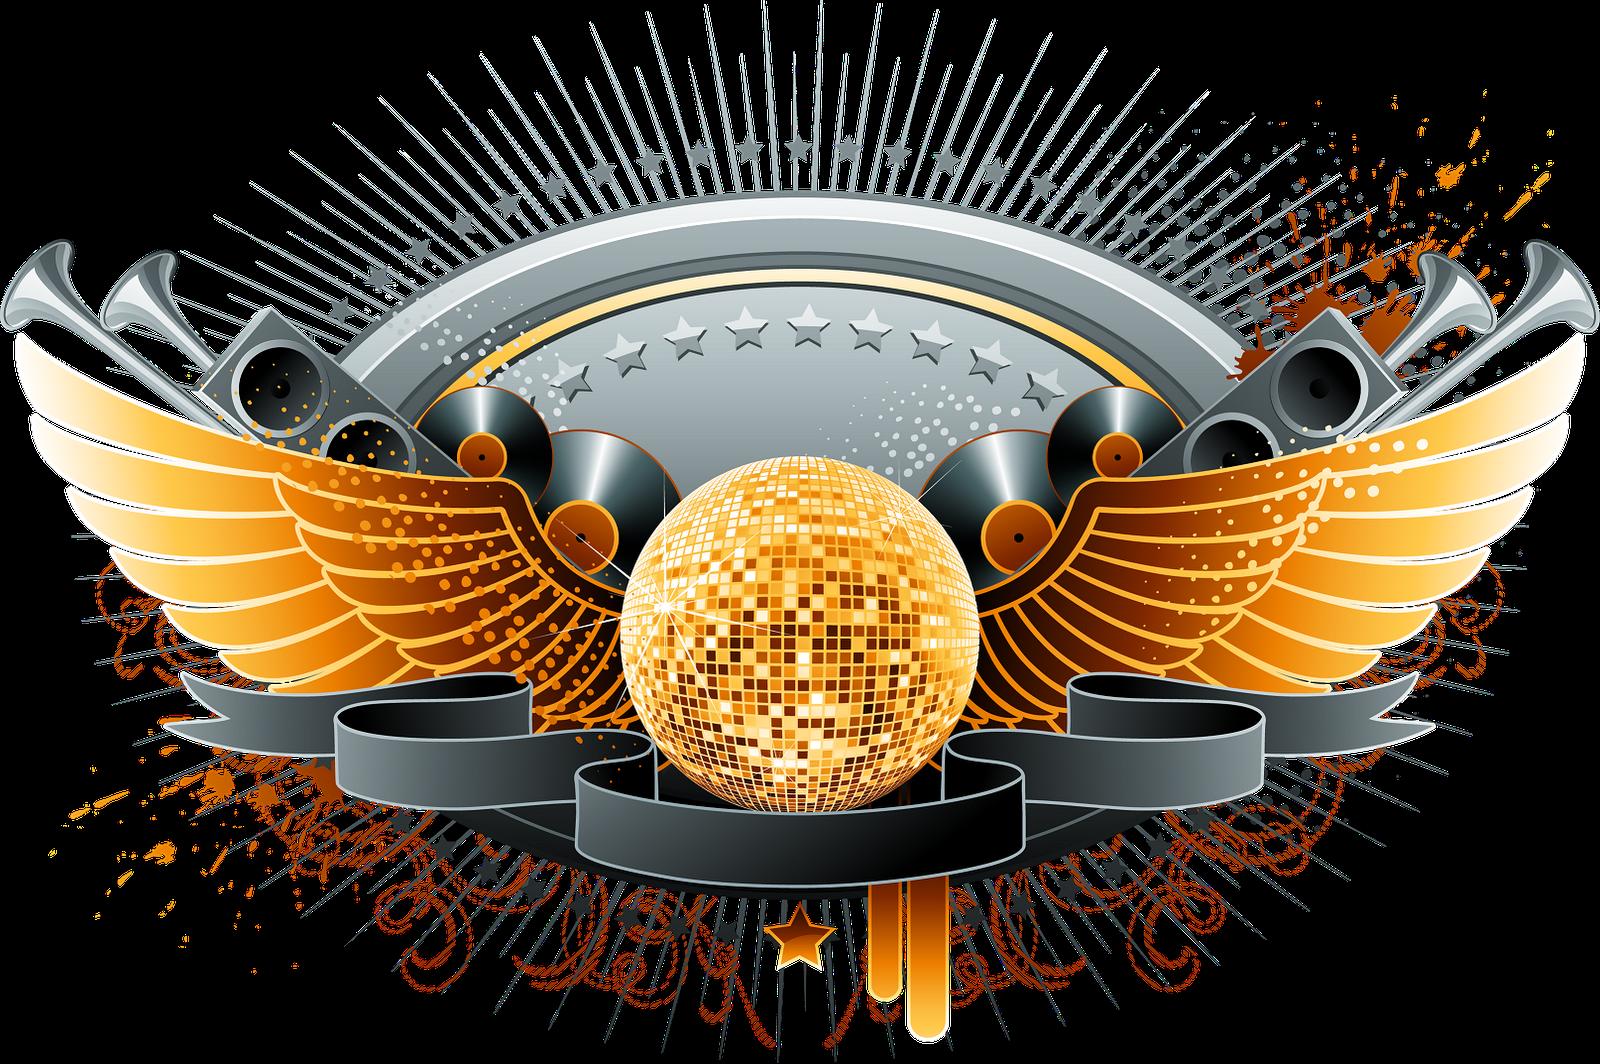 download music free download hq png image freepngimg